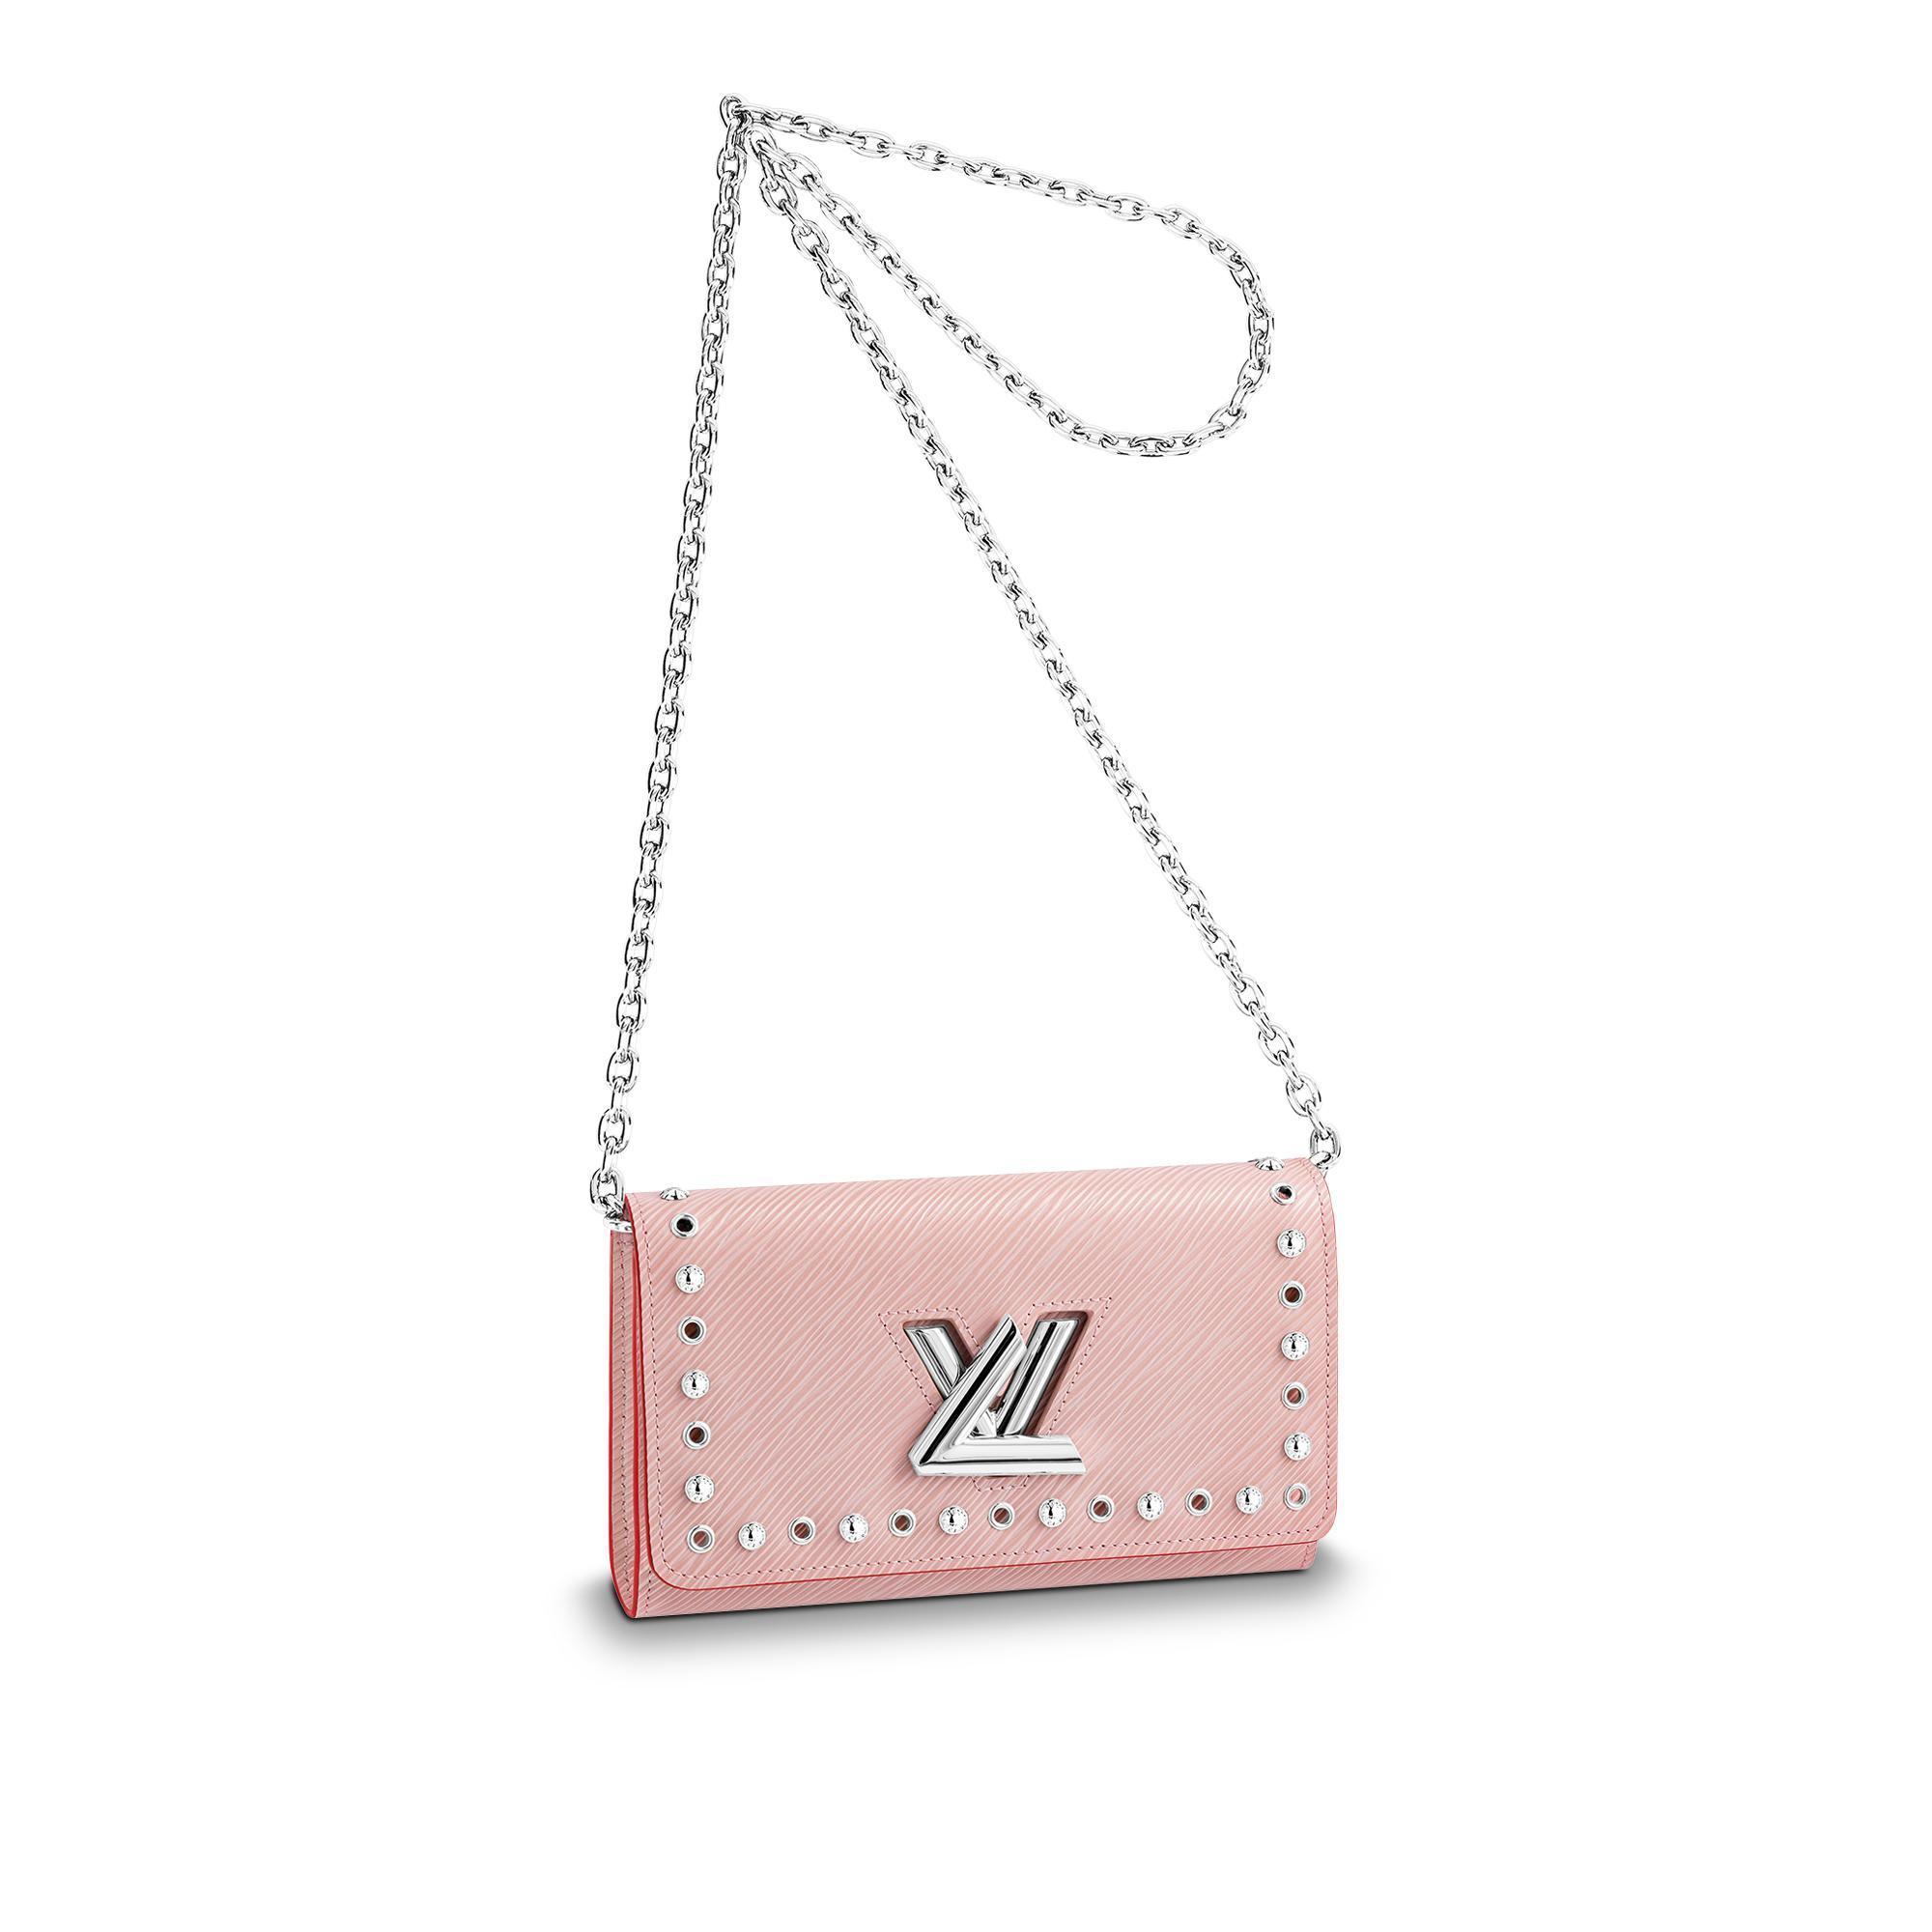 b01e4c5c4ea4 Louis Vuitton Twist Chain Wallet In Rose Ballerine